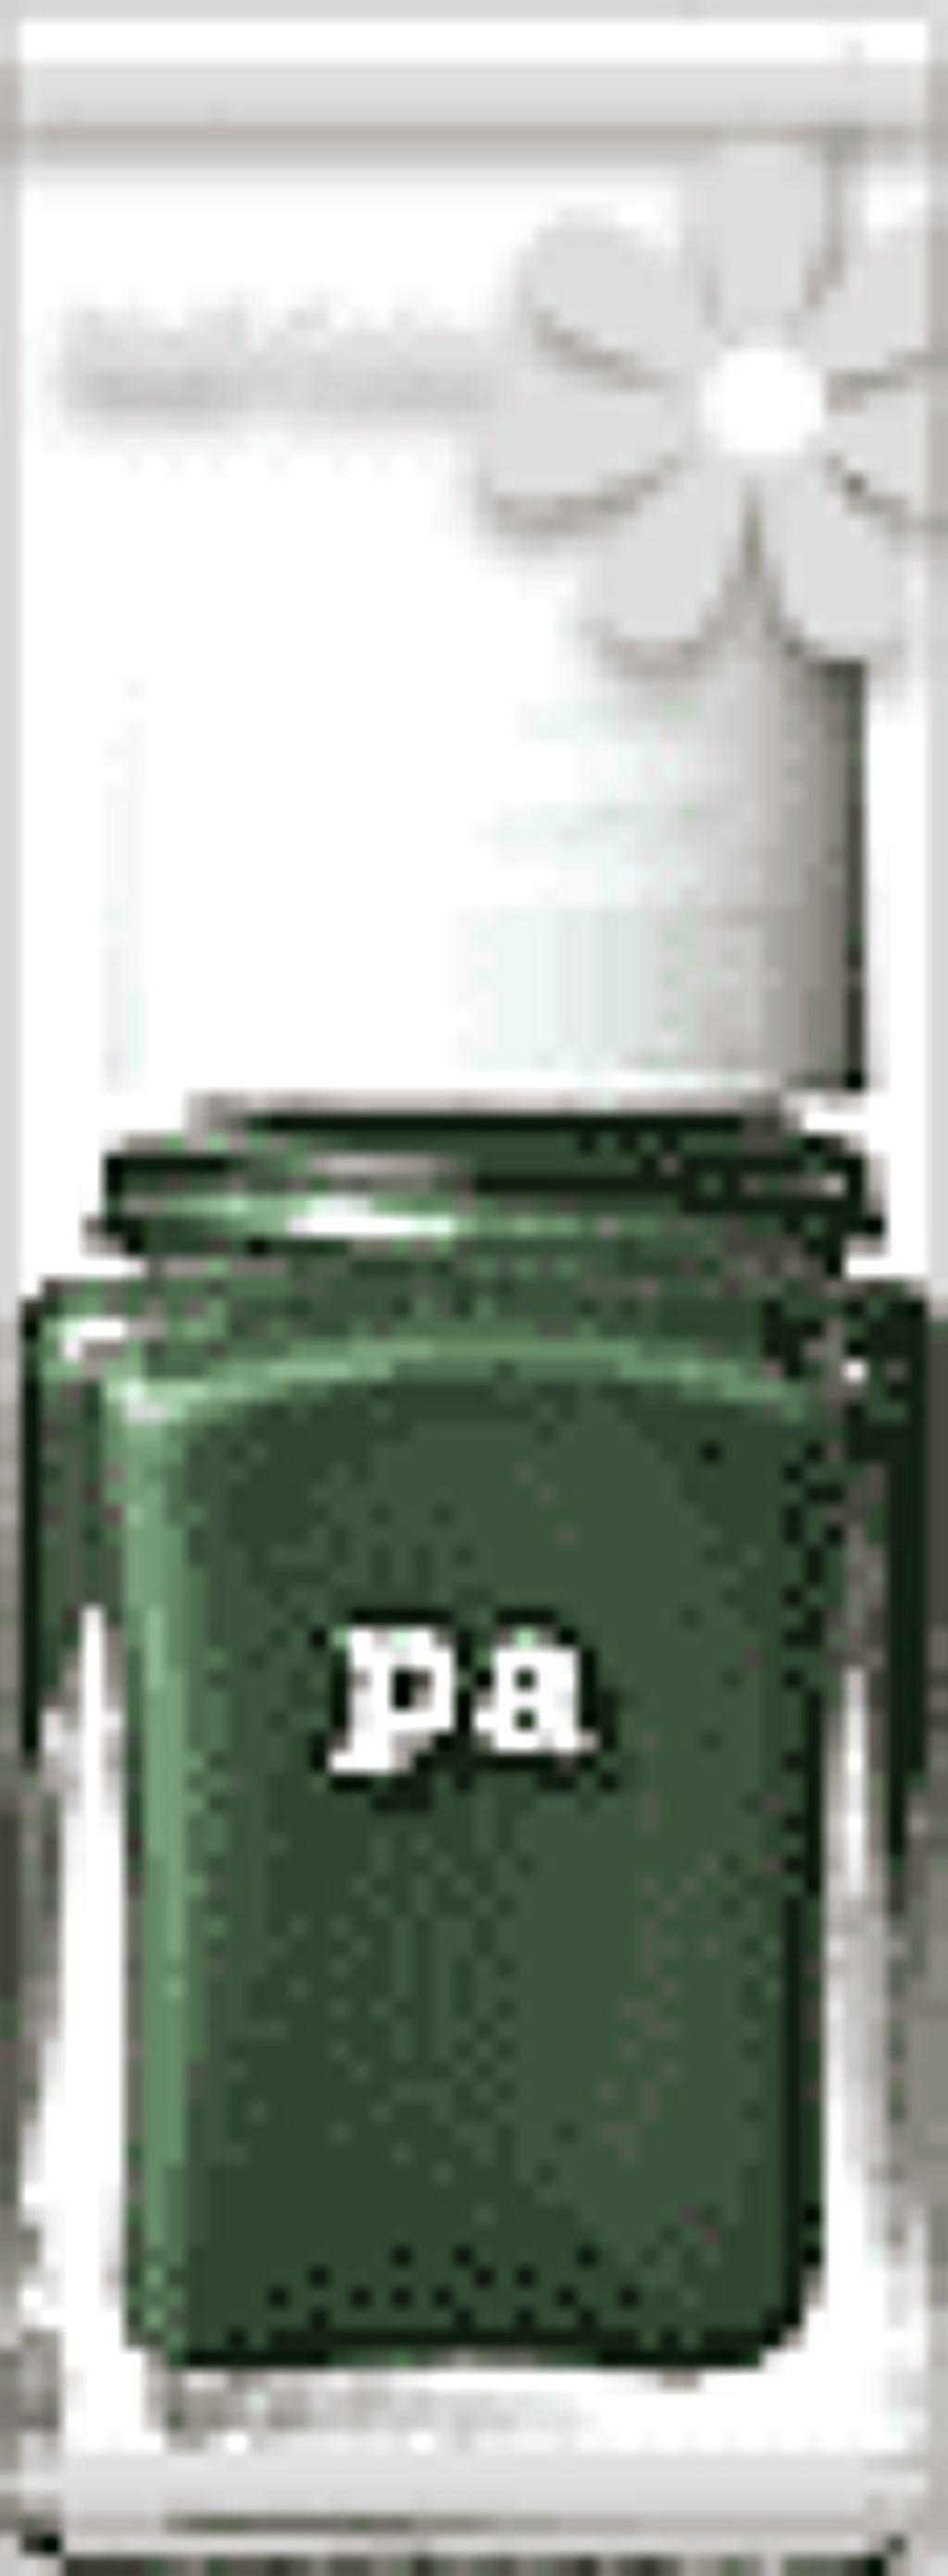 pa ネイルカラー(旧) A32